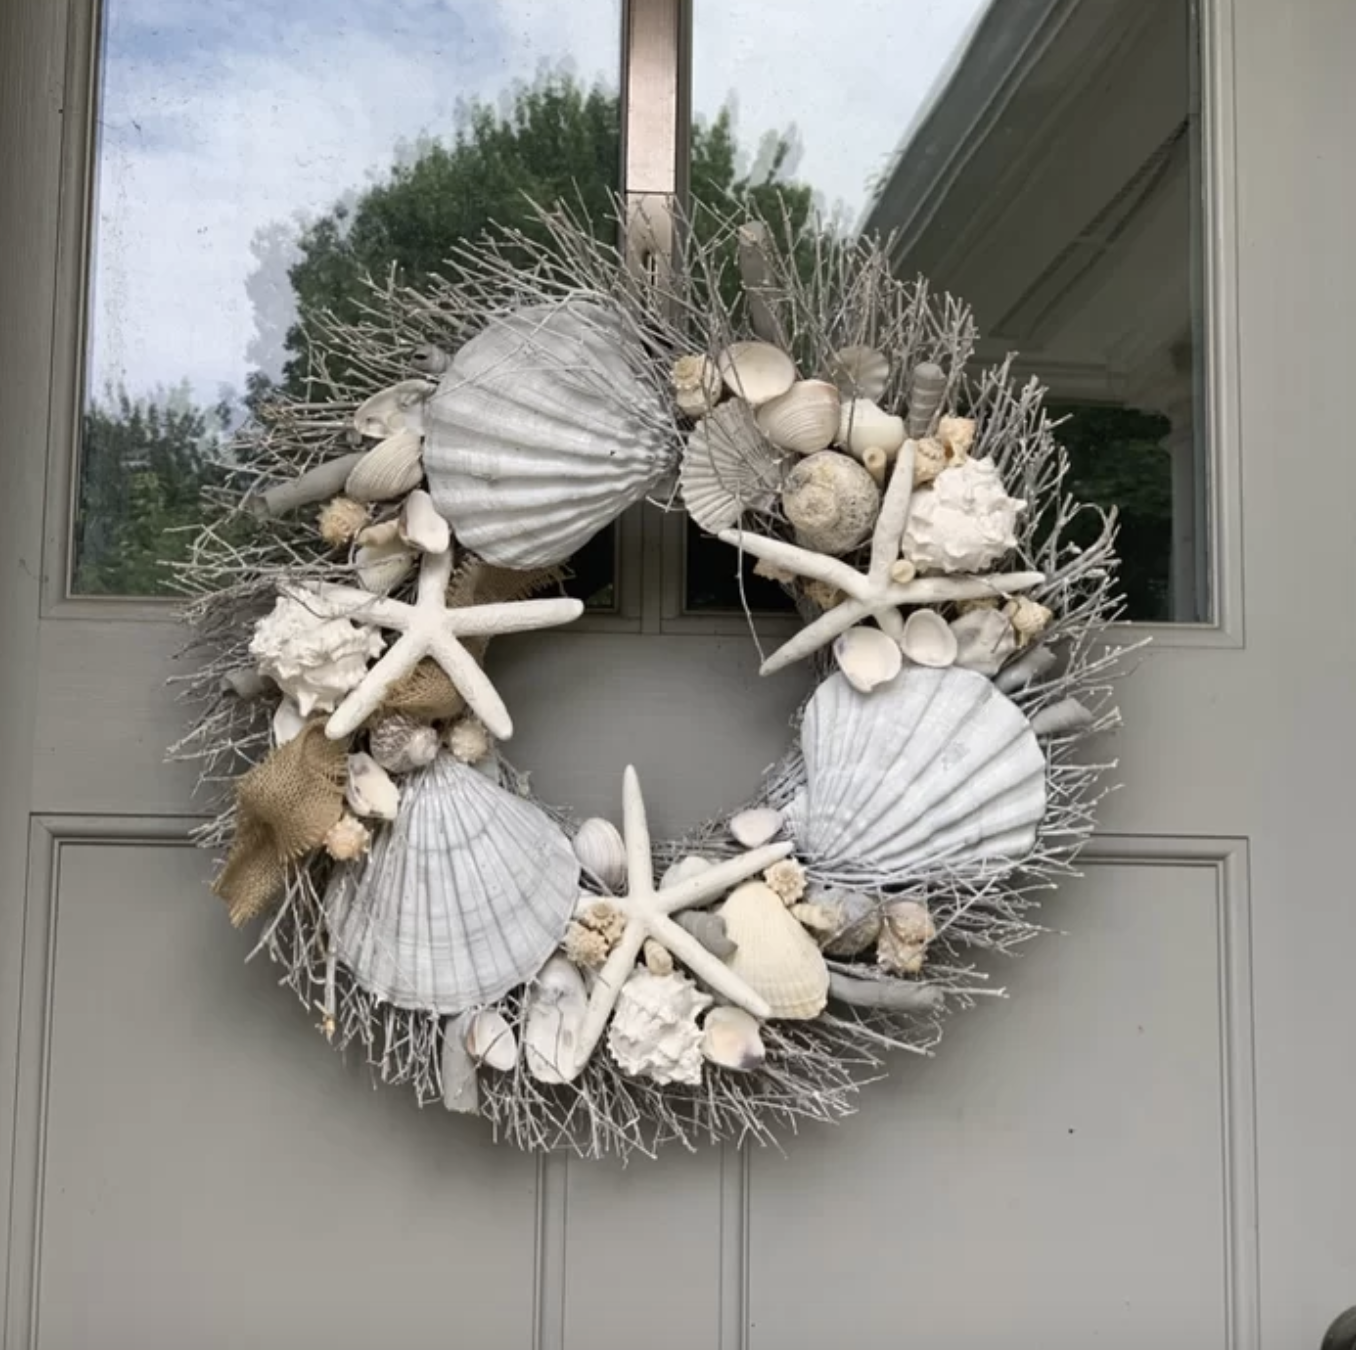 The seashell reef on a door